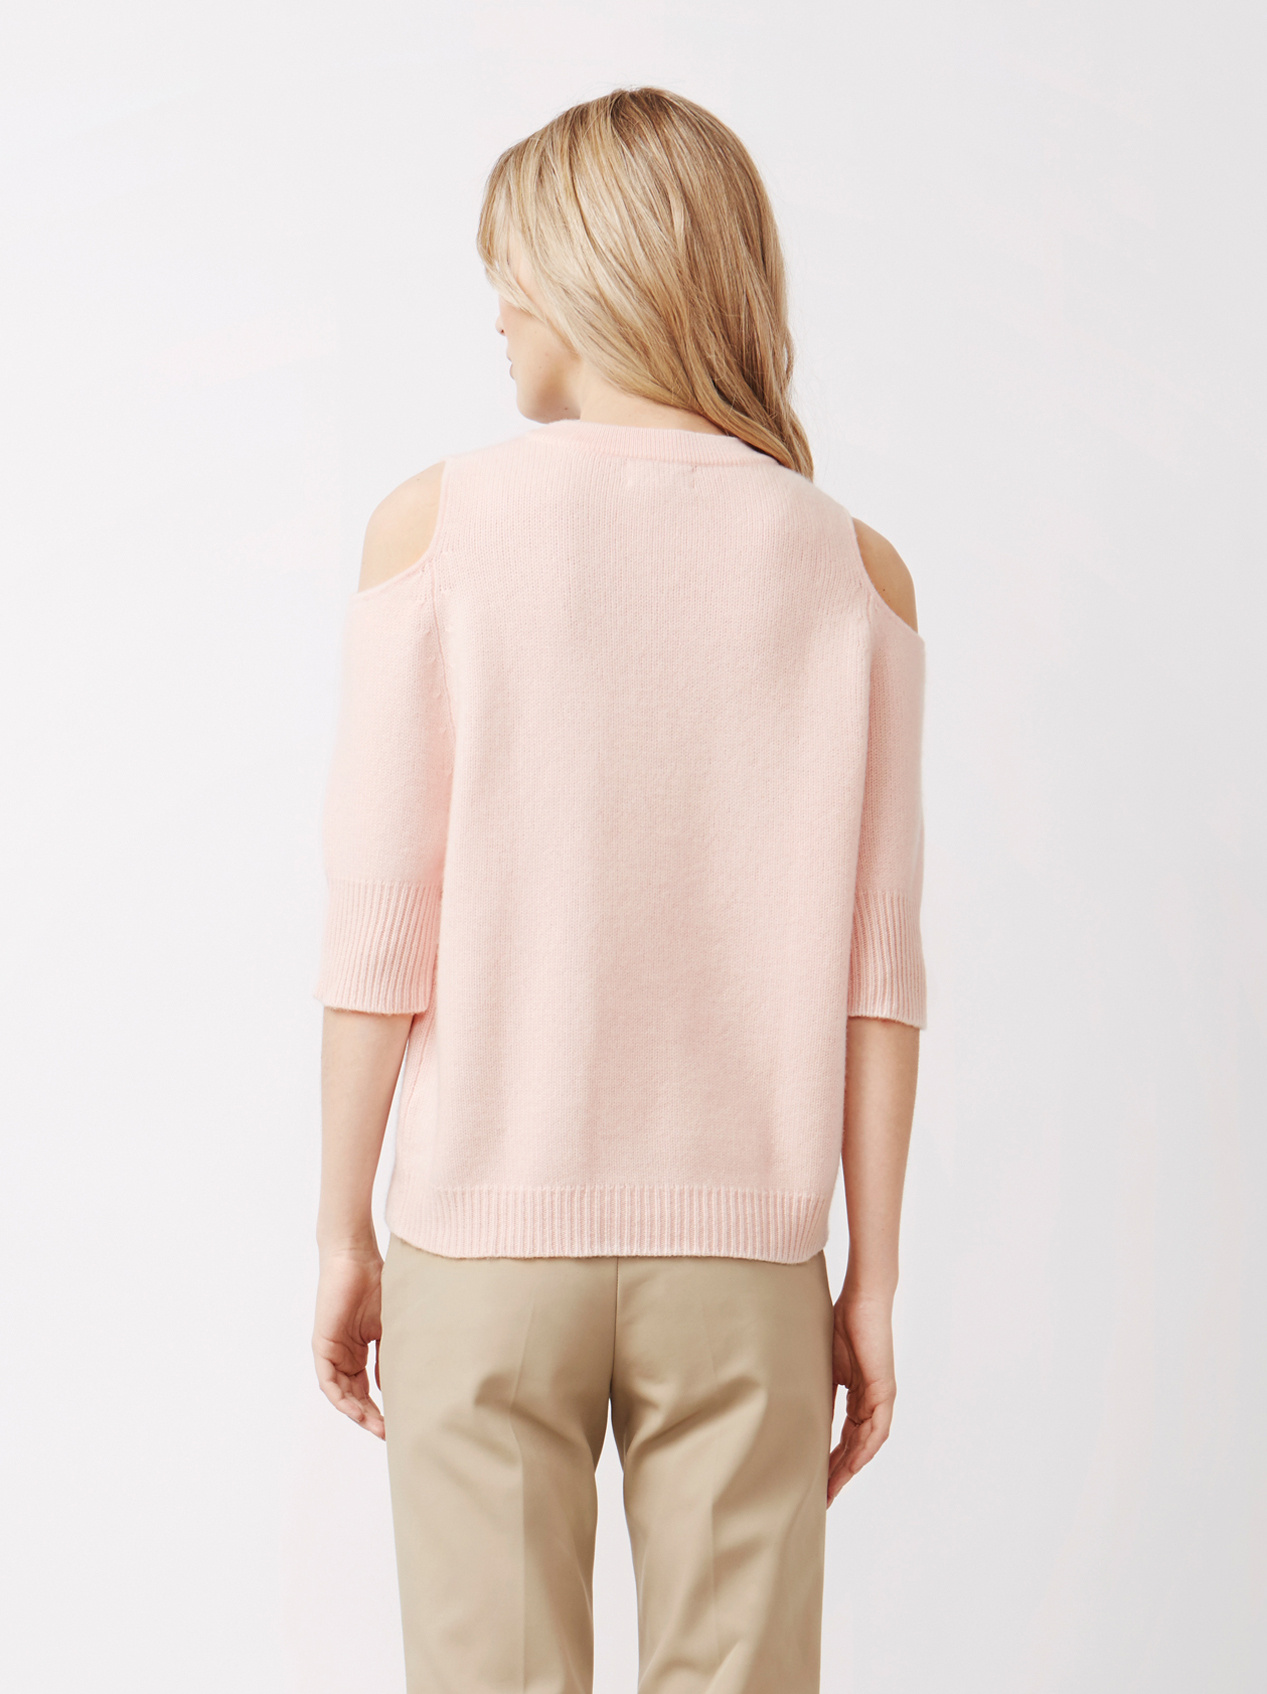 Soft Goat Women's Cold Shoulder Sweater Powder